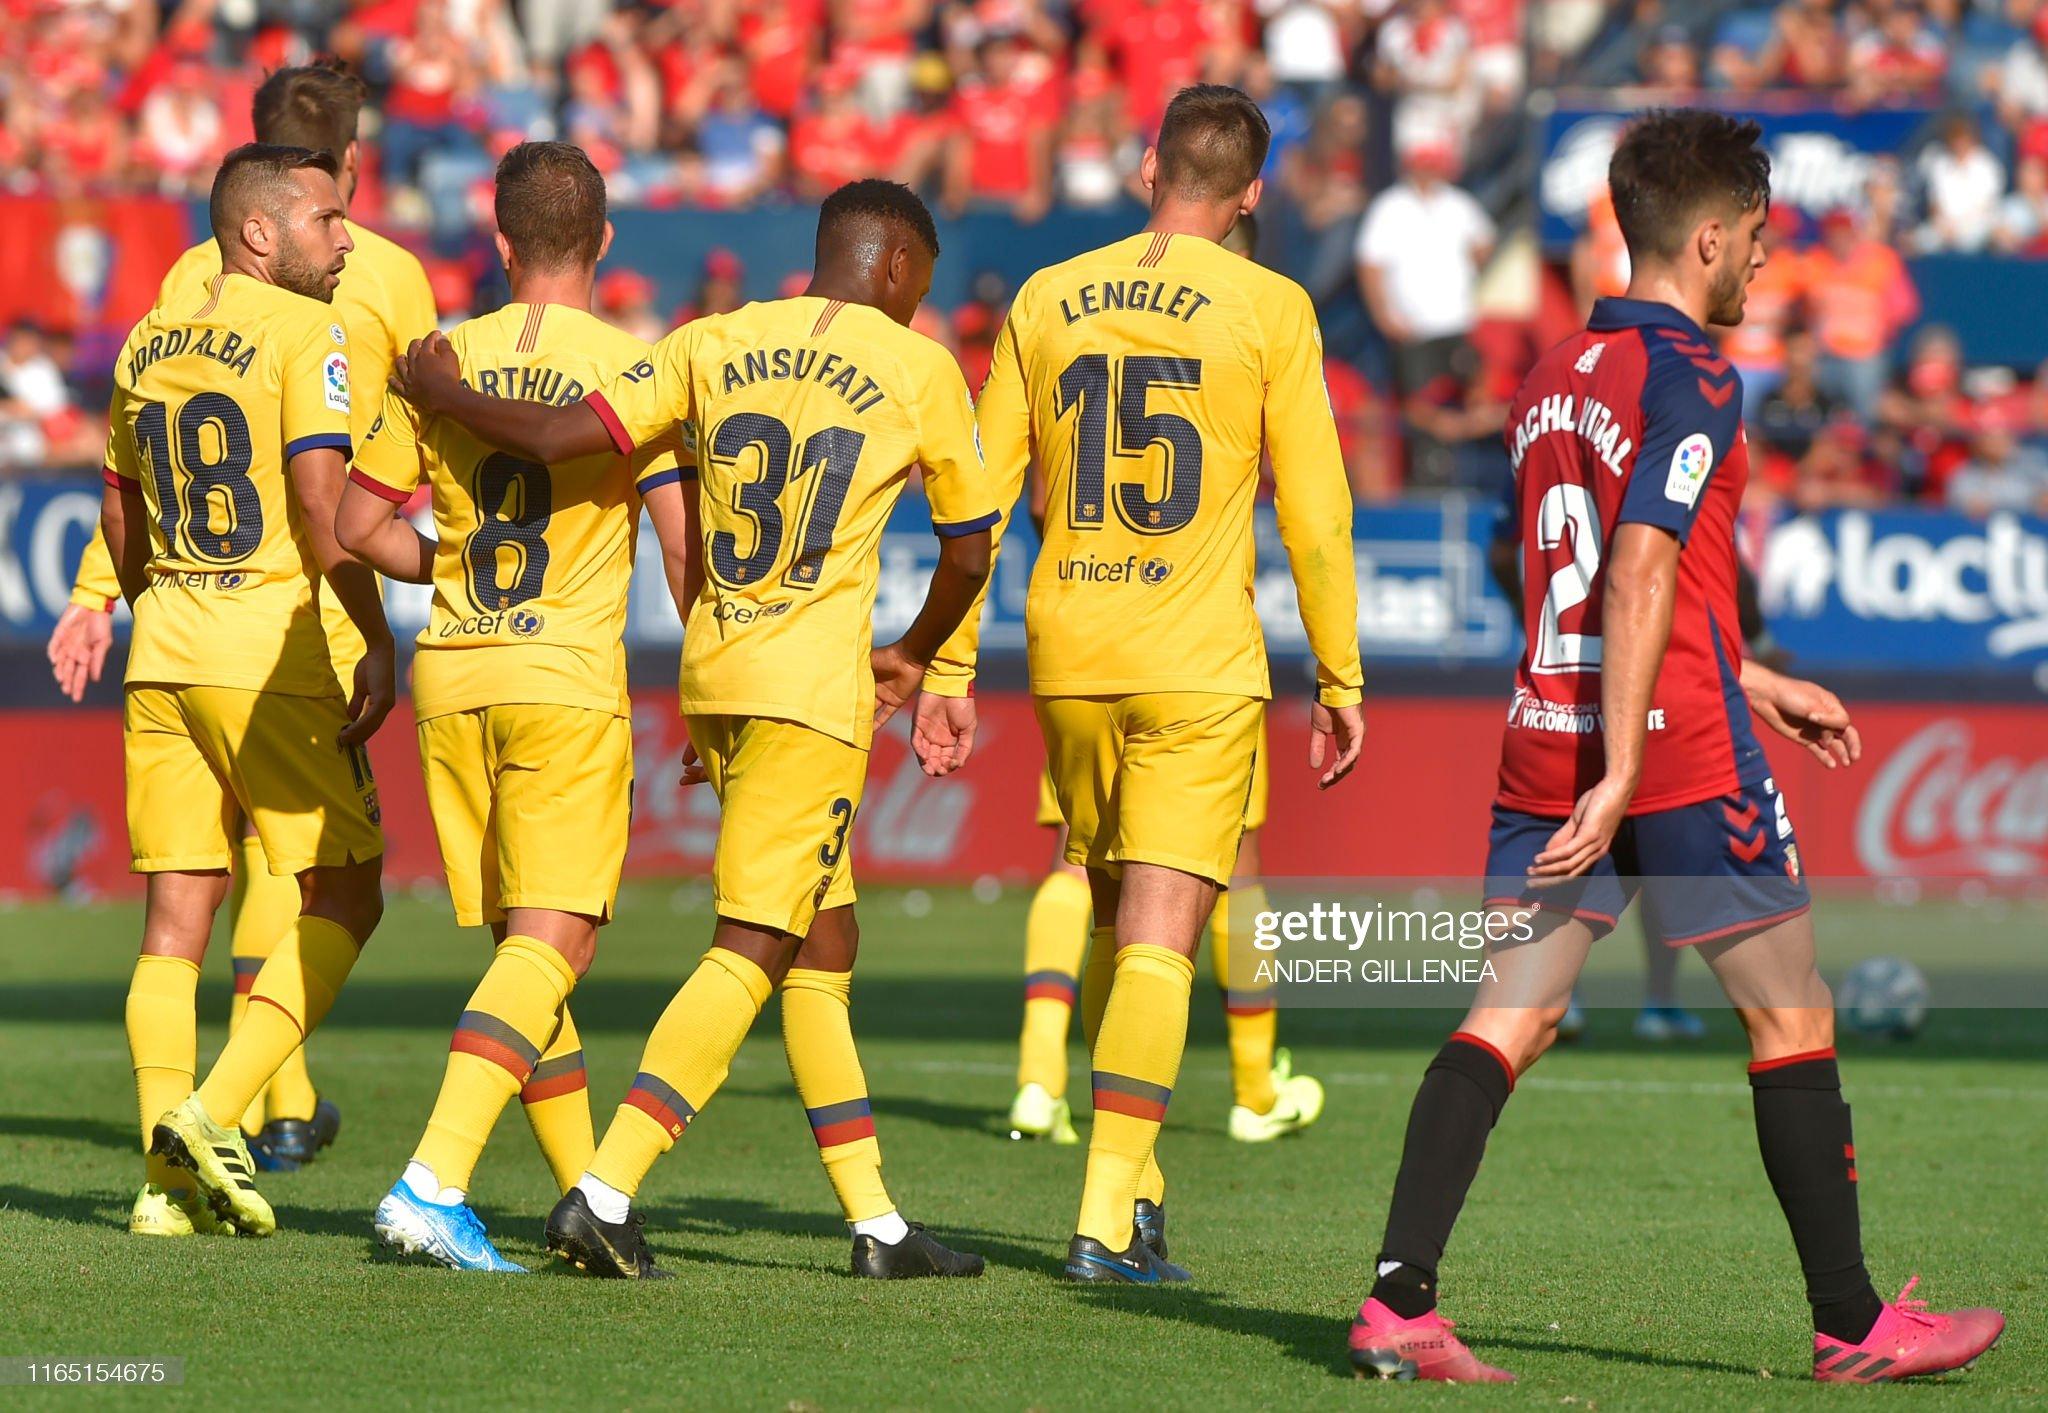 صور مباراة : أوساسونا - برشلونة 2-2 ( 31-08-2019 )  Barcelonas-players-celebrate-after-barcelonas-brazilian-midfielder-picture-id1165154675?s=2048x2048